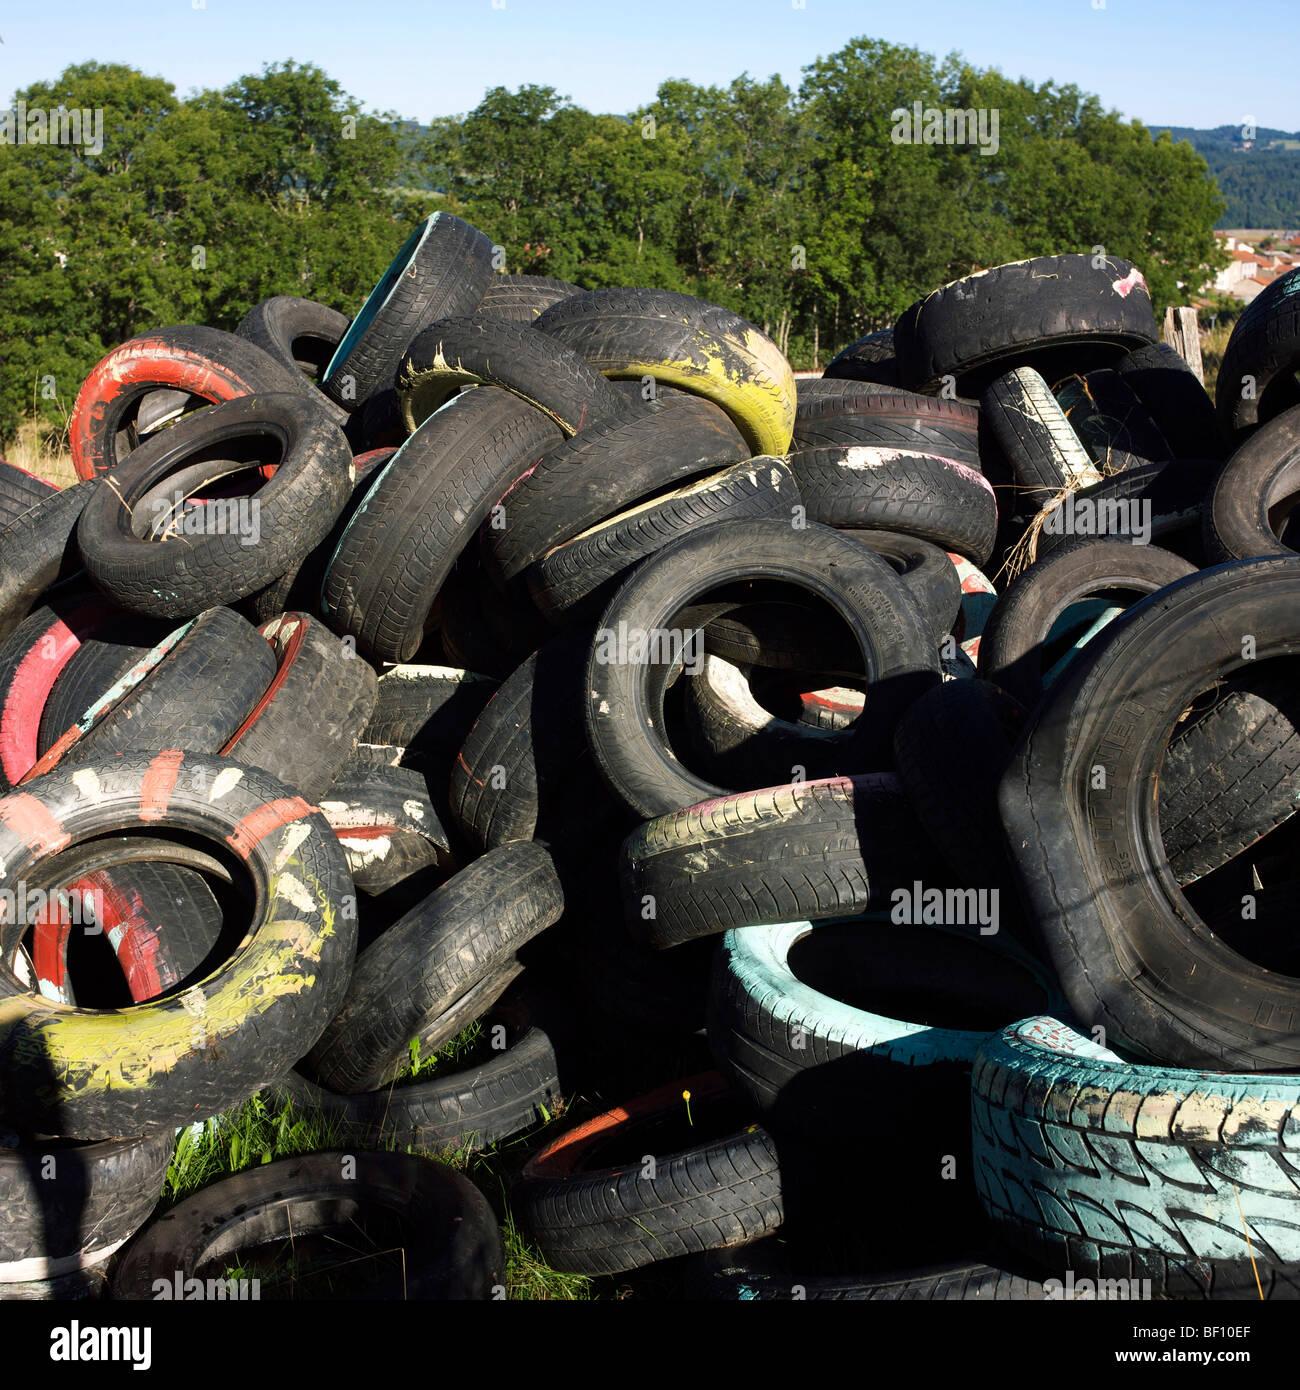 Pila di vecchi pneumatici in gomma in campagna. Immagini Stock